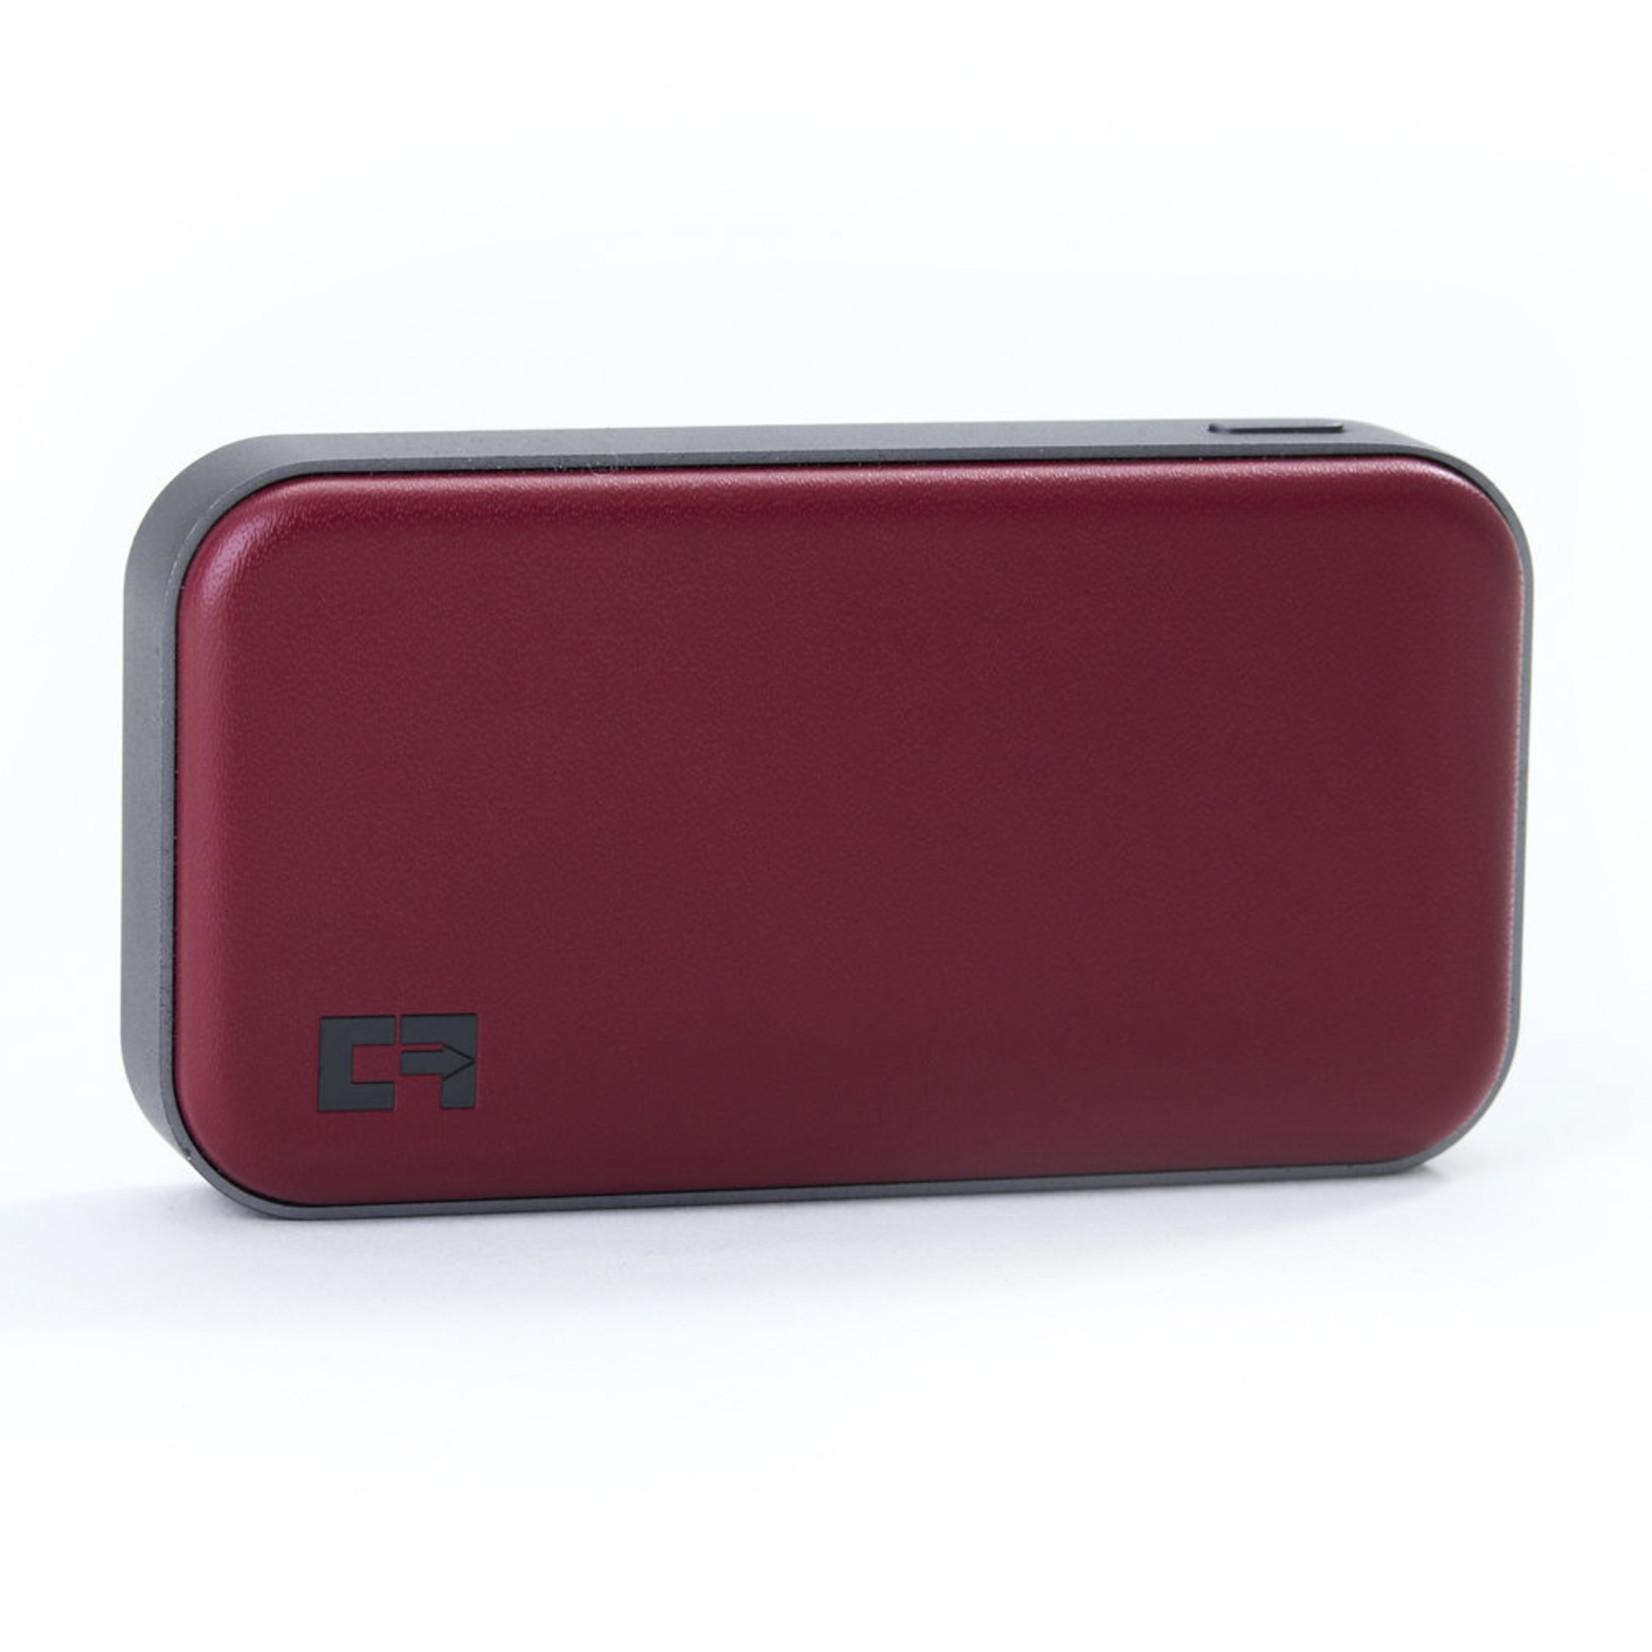 Capture Flow Capture Flow Mighty Sound Speaker Oxblood